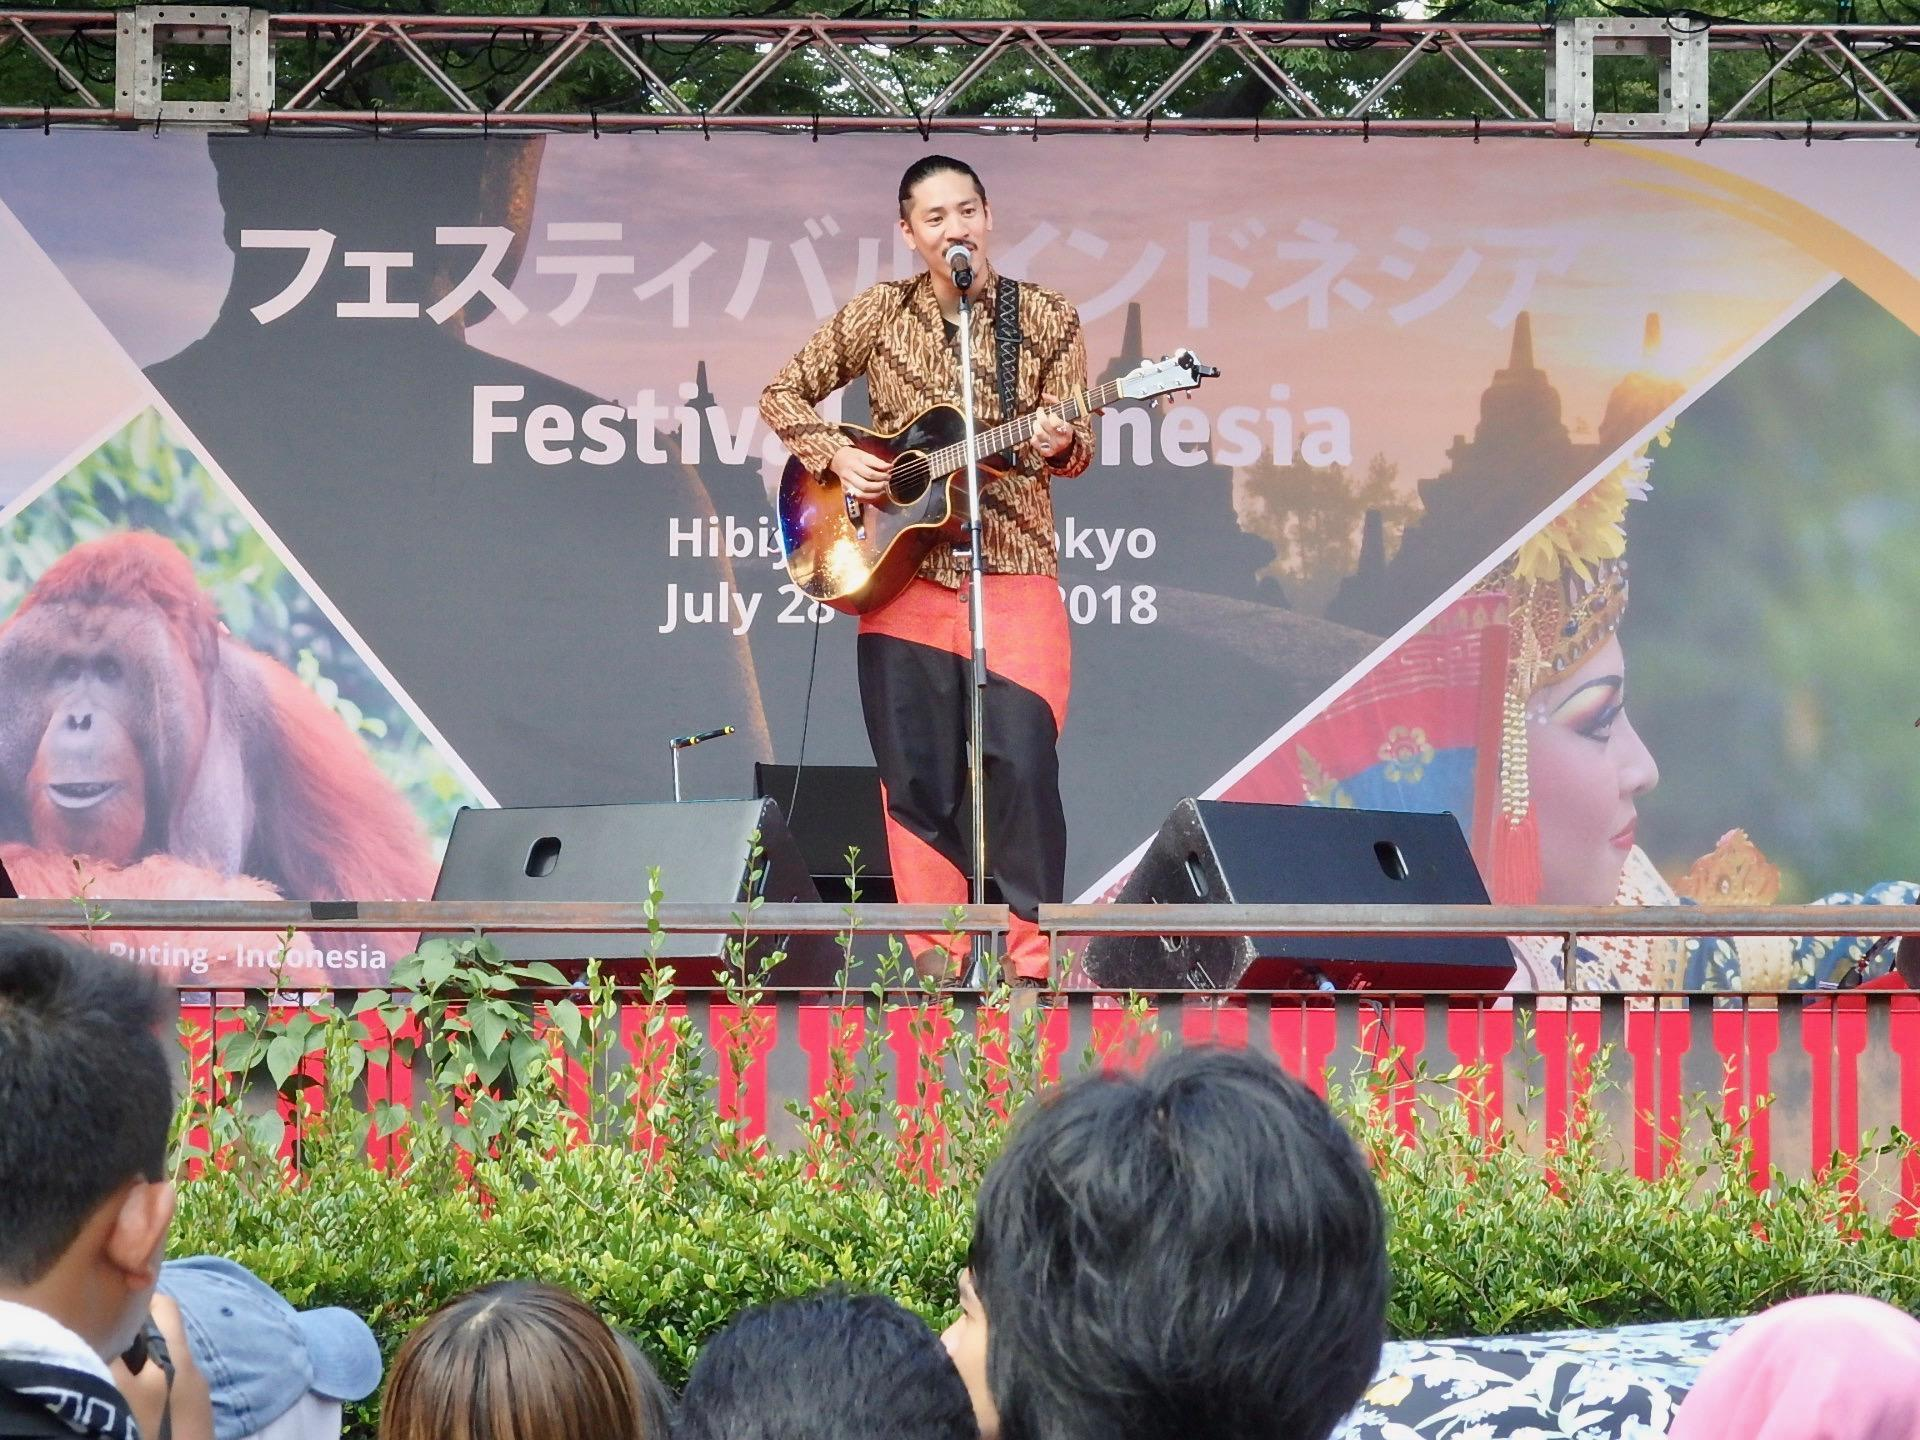 http://news.yoshimoto.co.jp/20180731170423-652201f0494441d088cae03c41634939116410f3.jpg